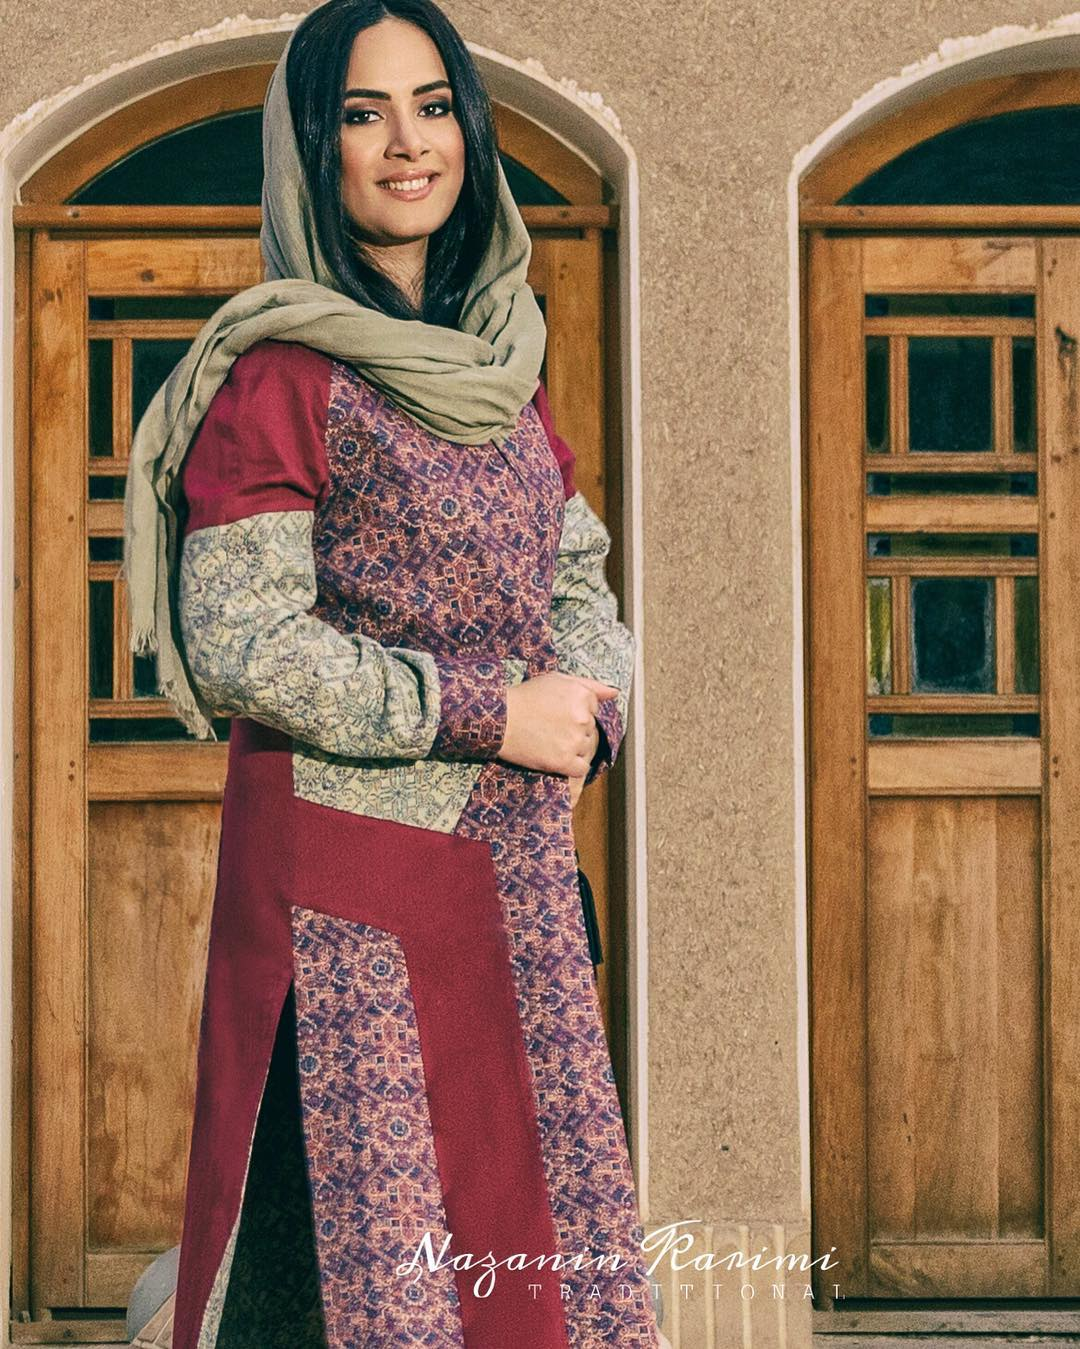 Two moods 😝 | Iranian women fashion, Muslim fashion, Arab